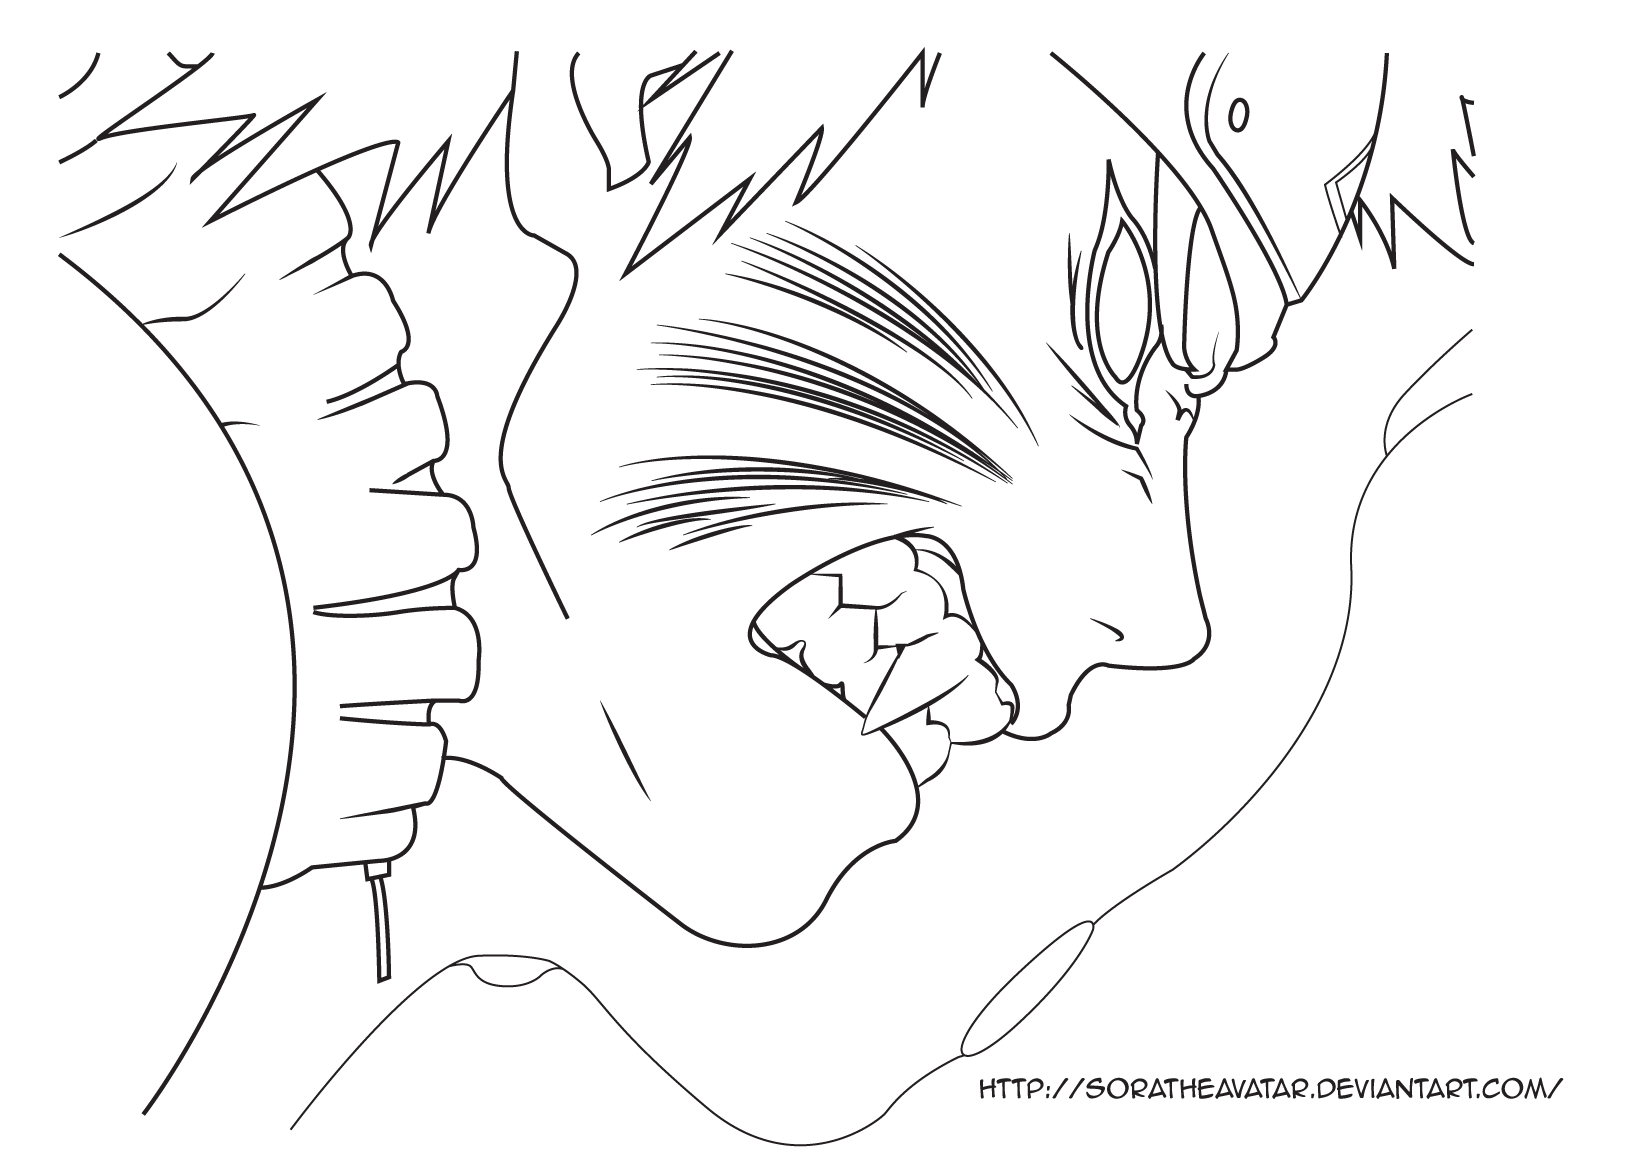 Line Art Png : Kyuubi naruto line art by soratheavatar on deviantart